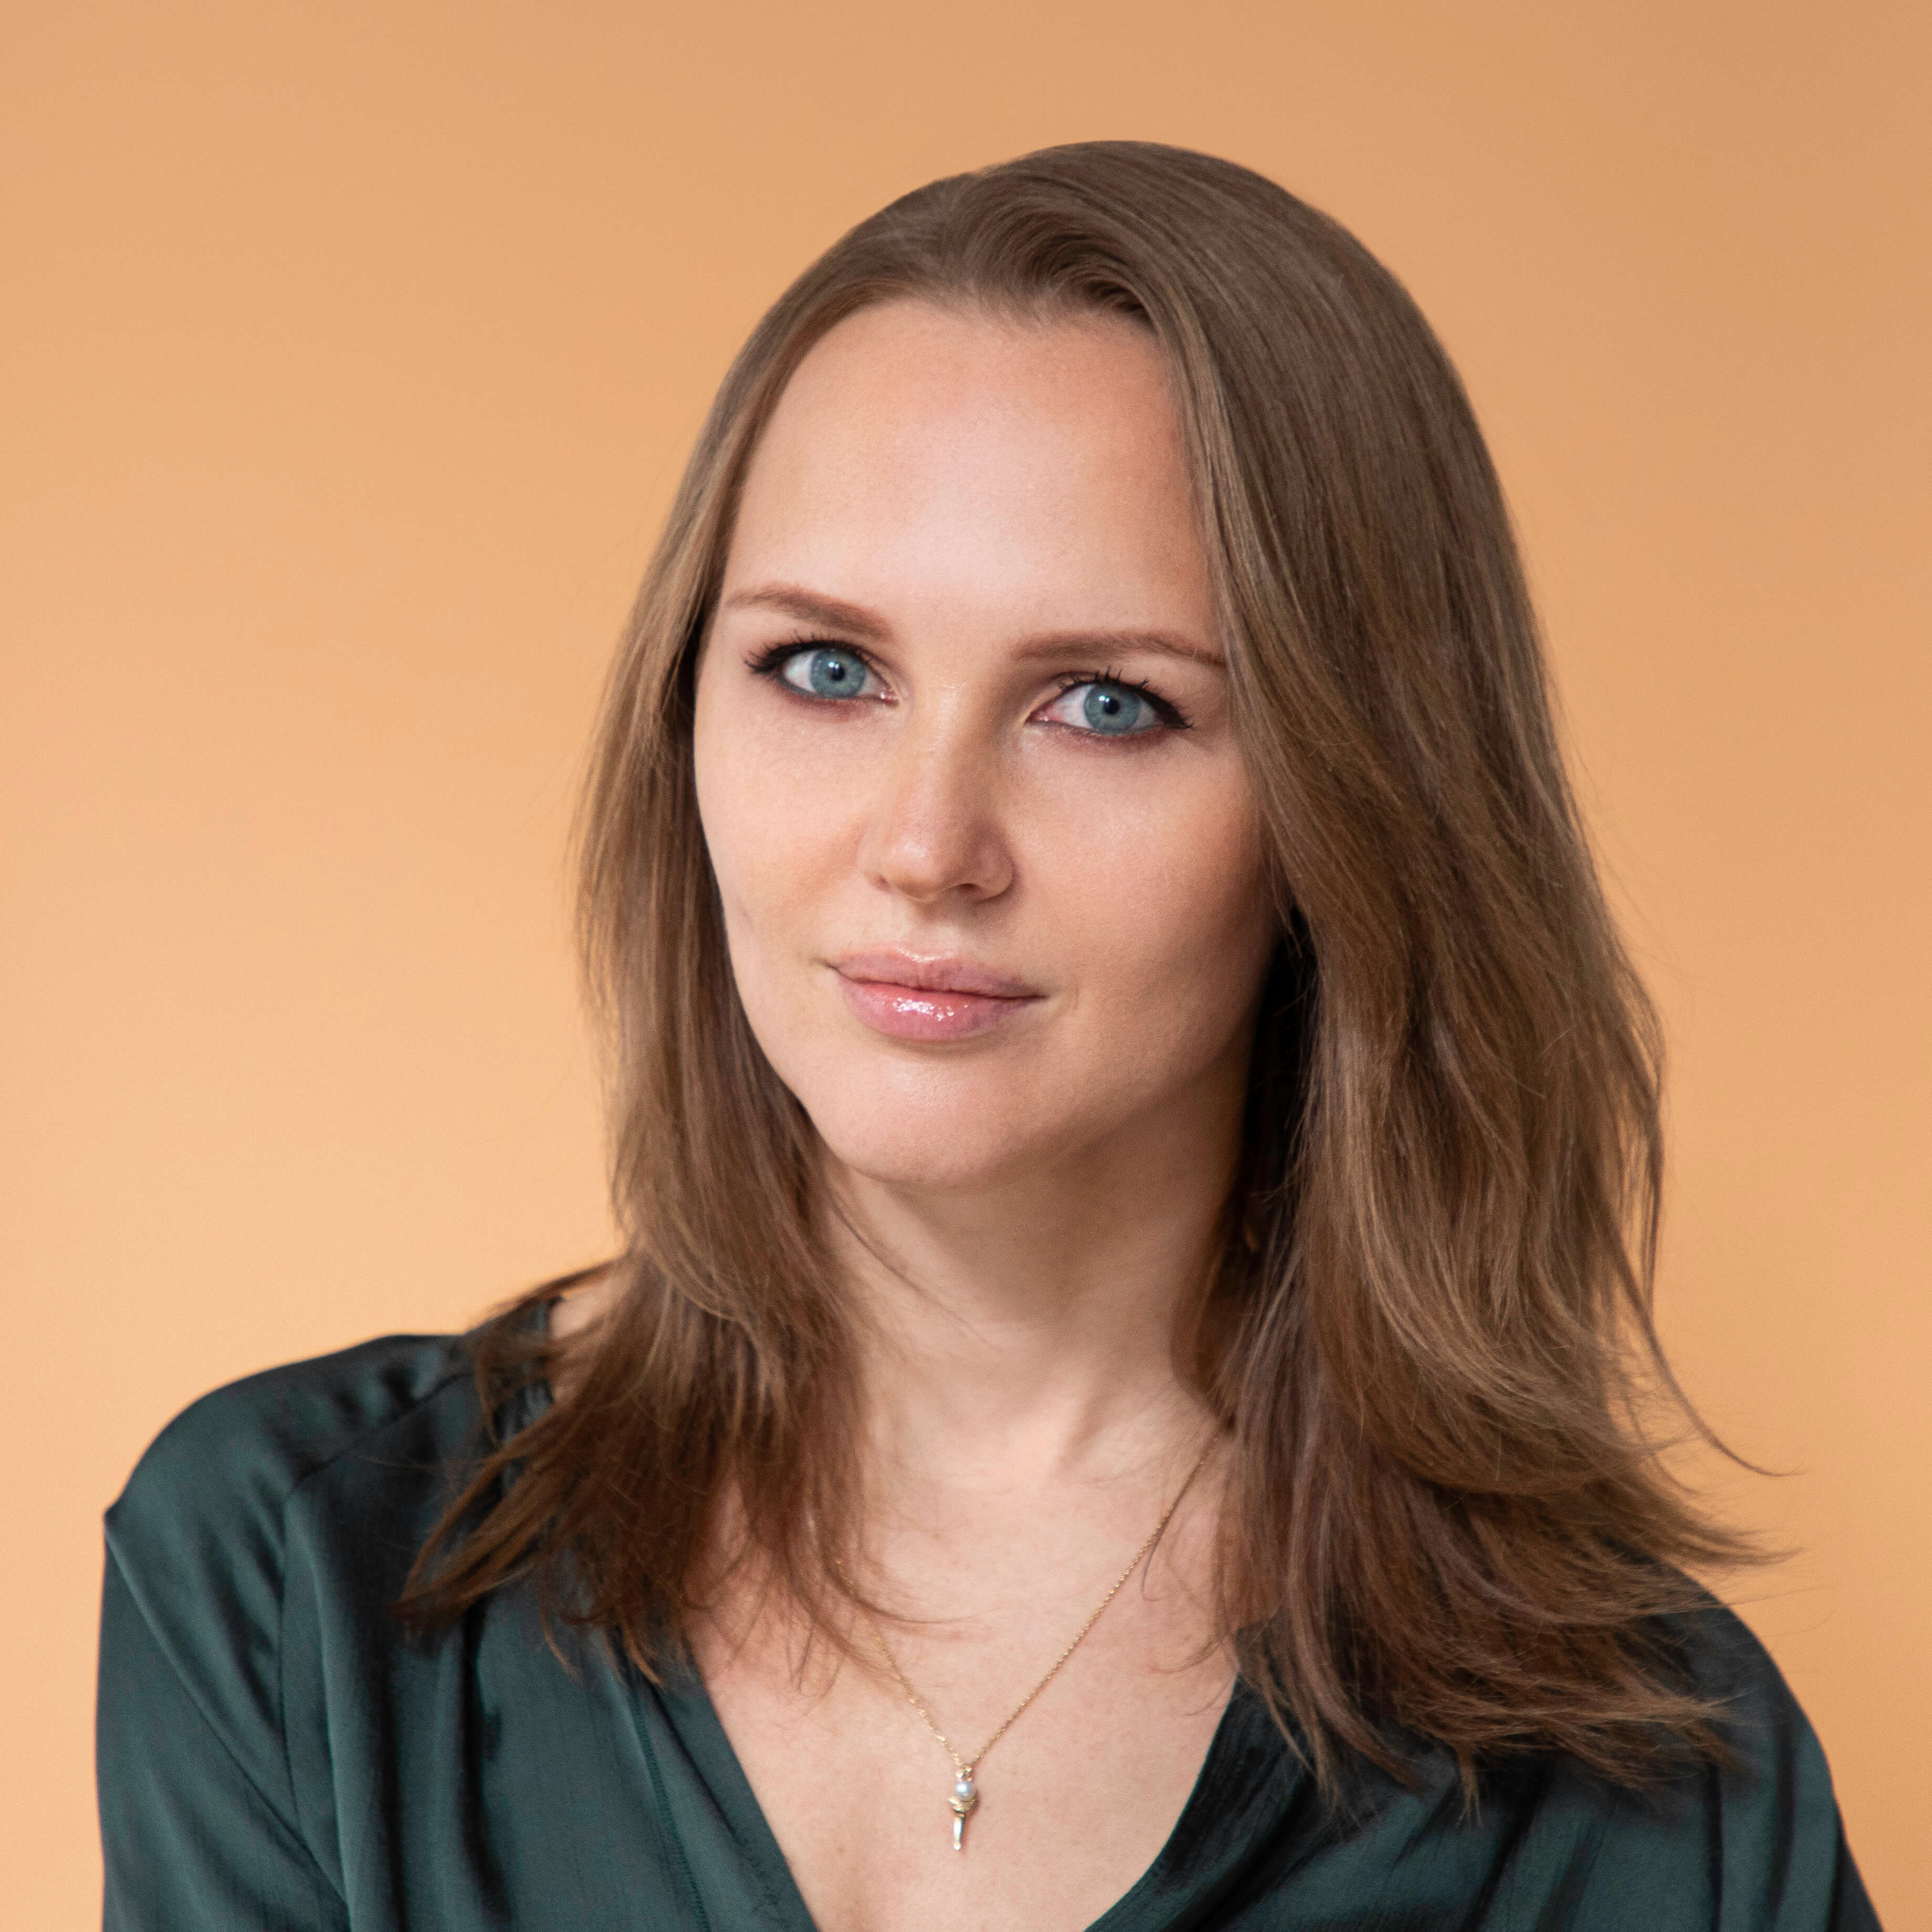 Simona Licehamrova photography Marlon Studio co-founder